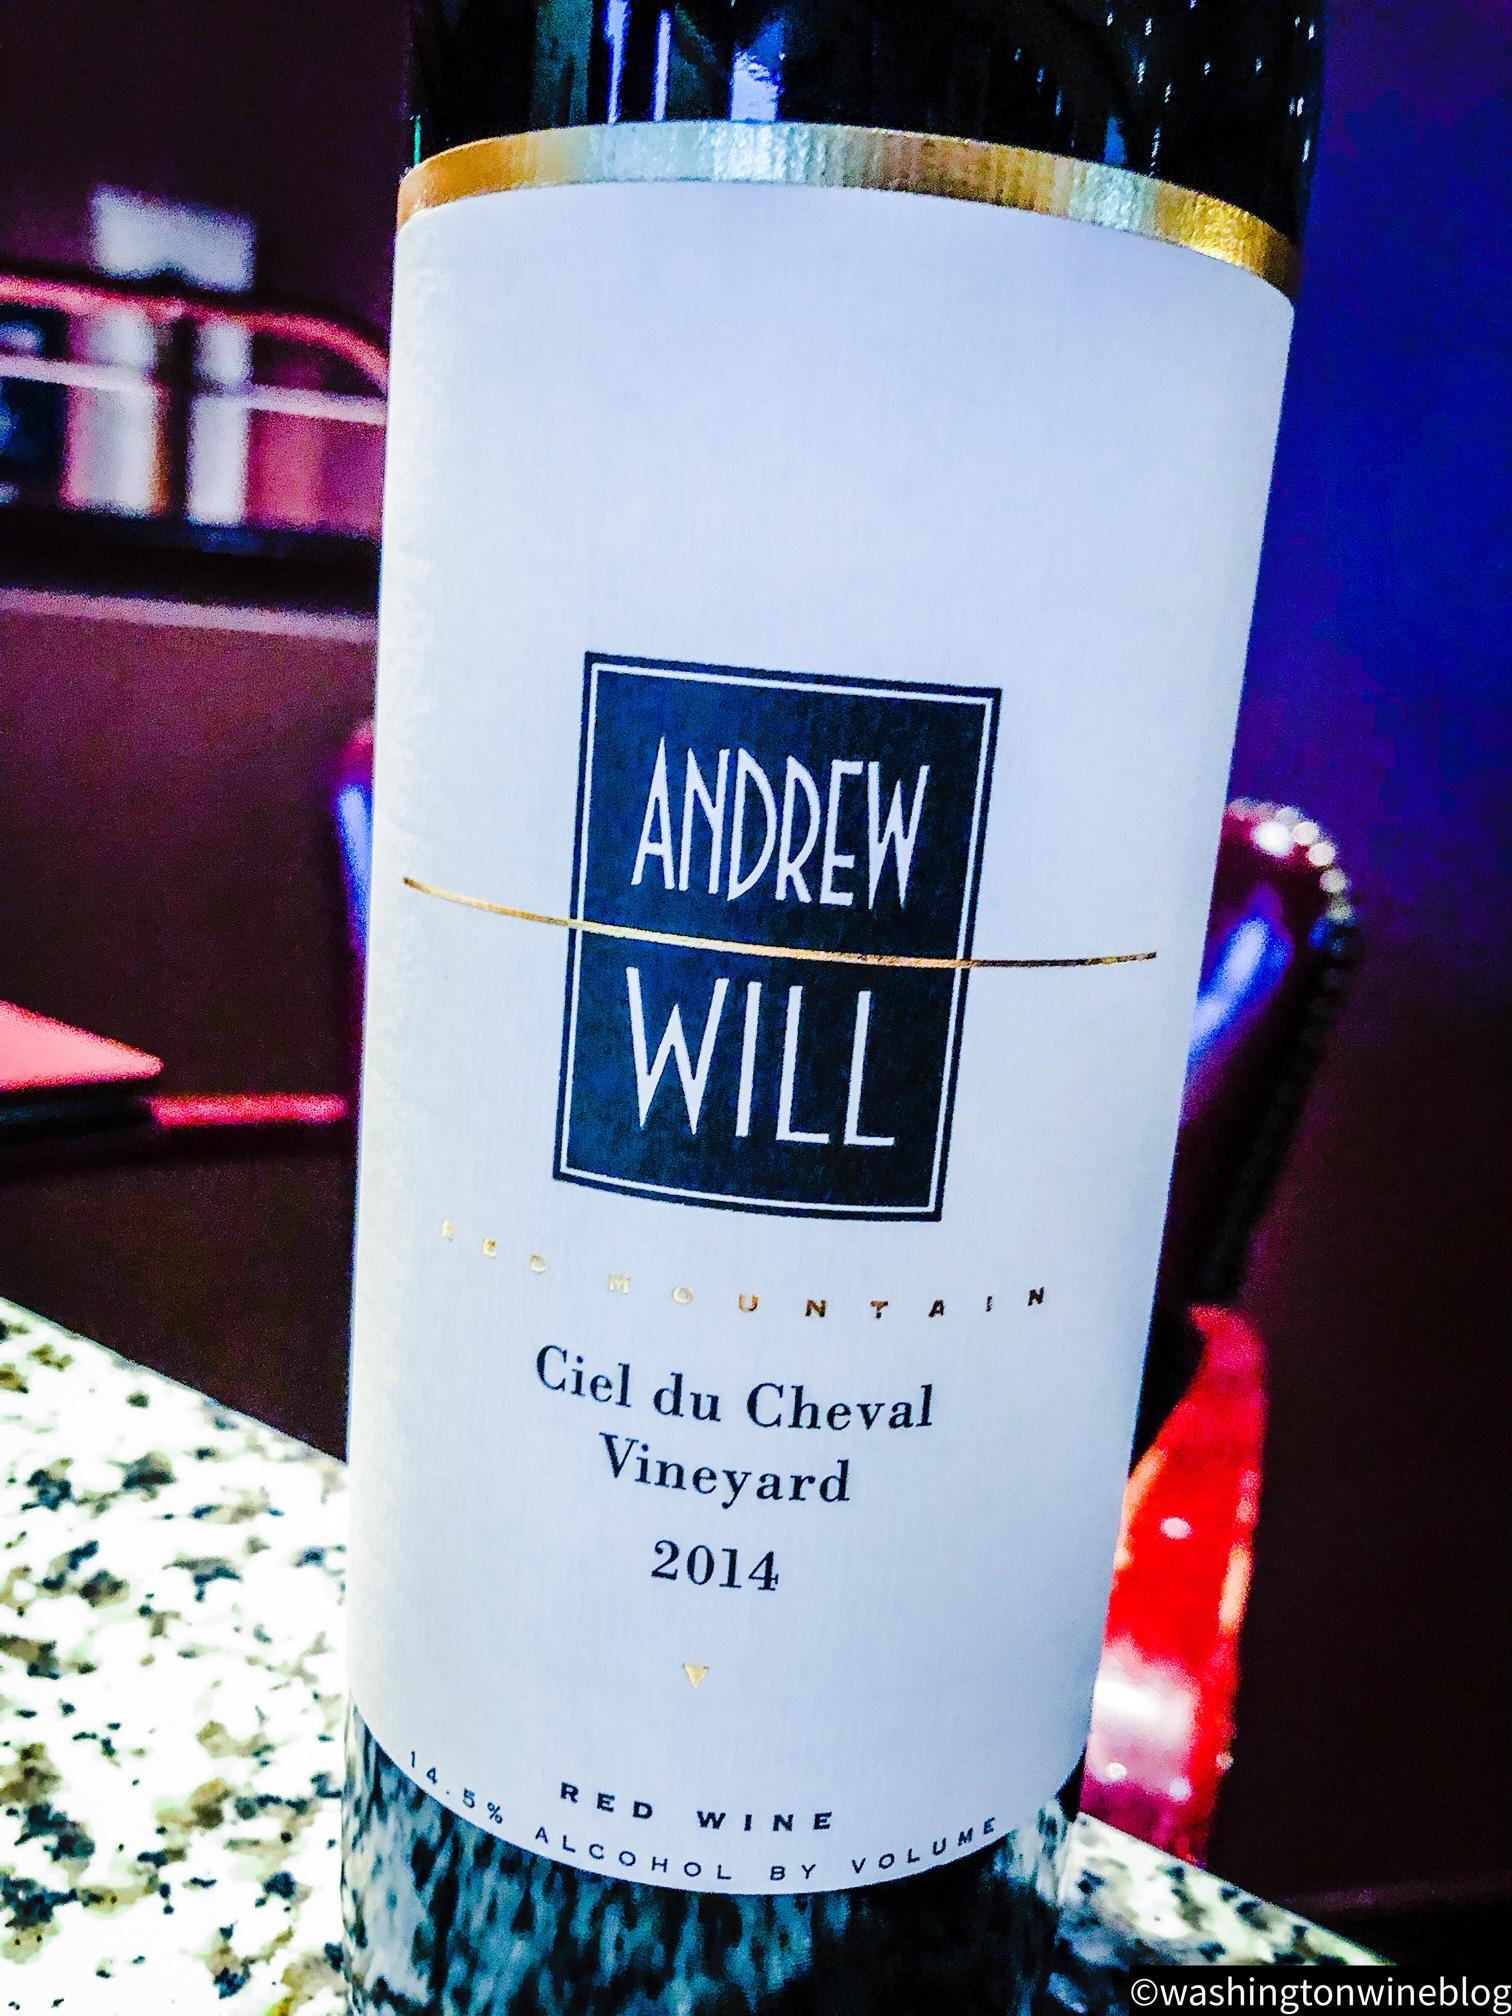 Andrew Will 2014 Ciel du Cheval.JPEG